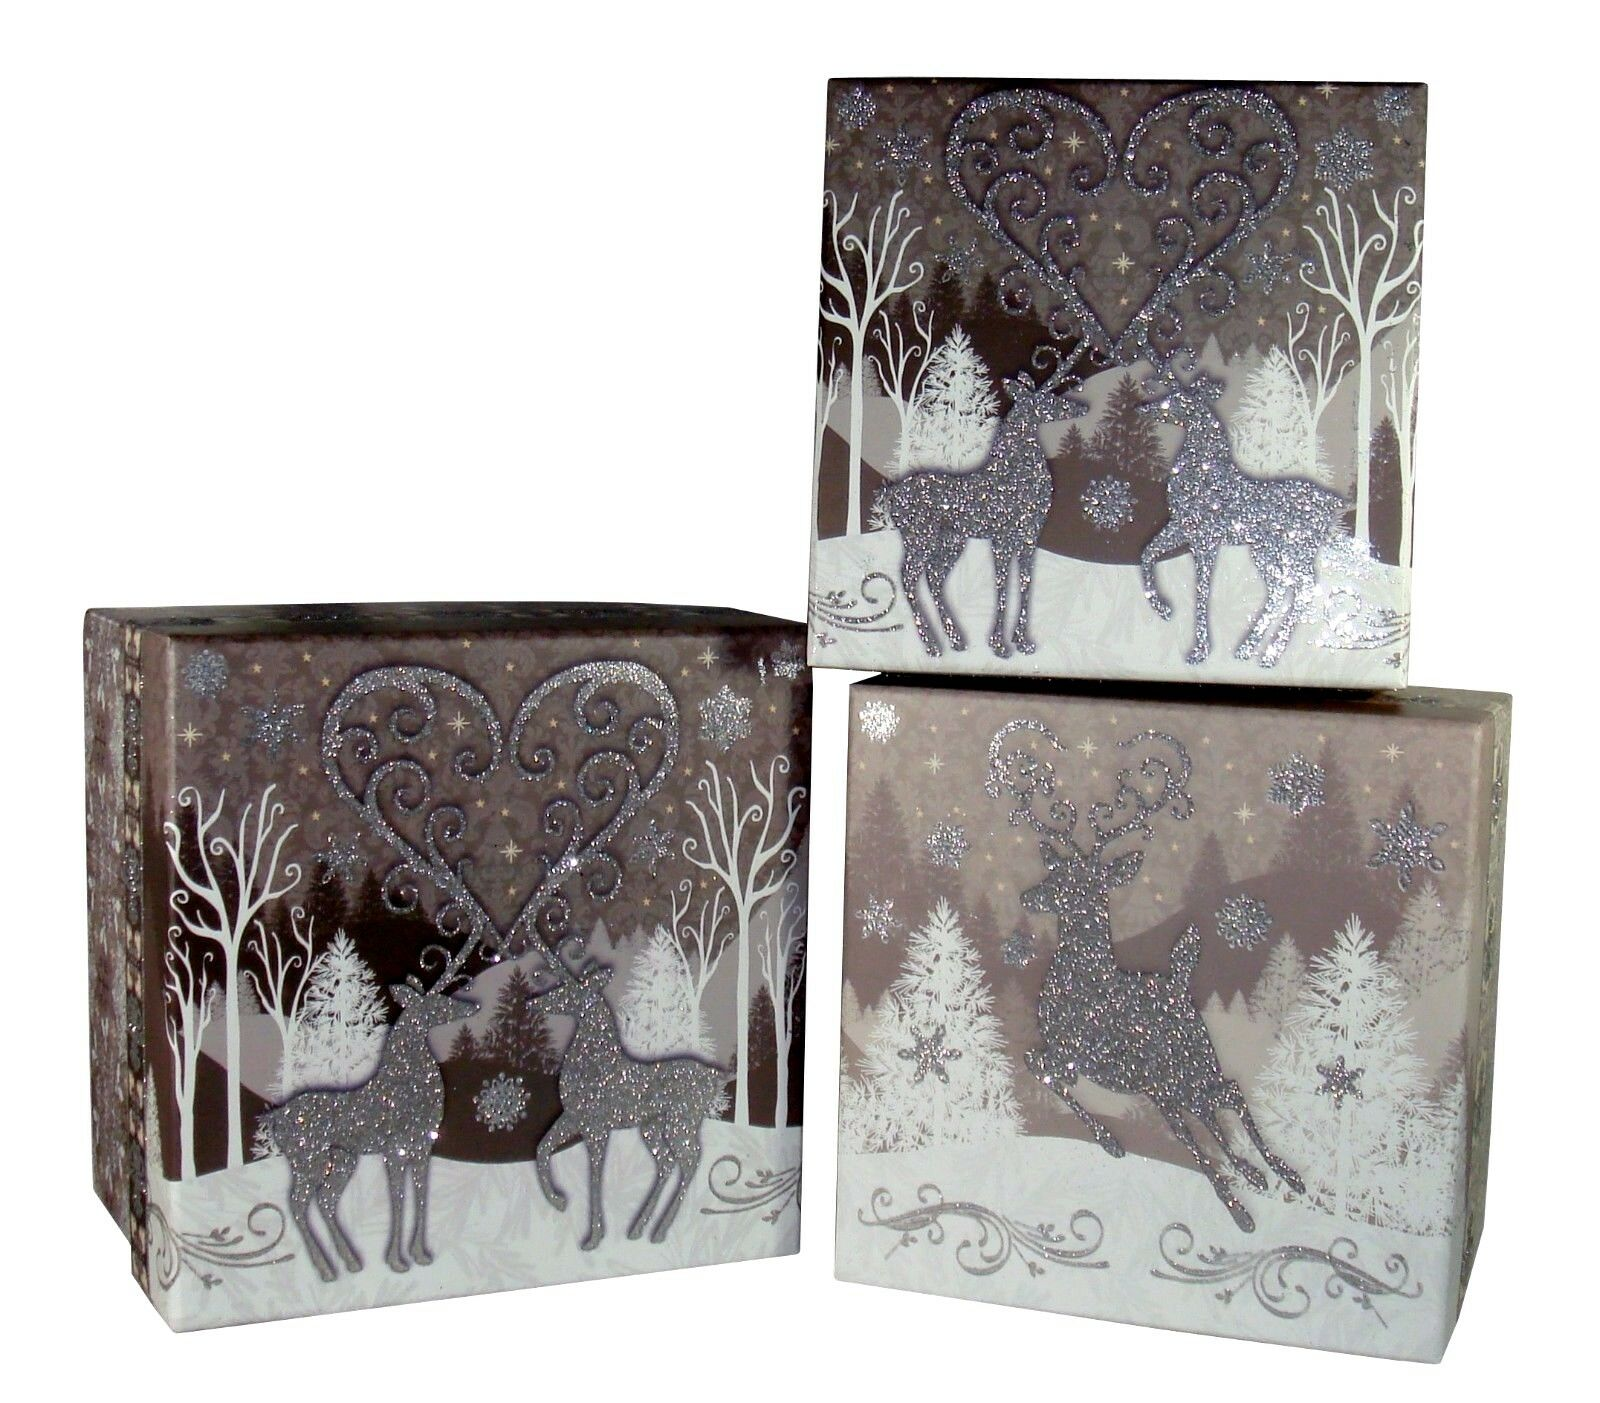 3 Pooch & Sweetheart Christmas Boxes Reindeer Heart Box 80918 Punch Studio